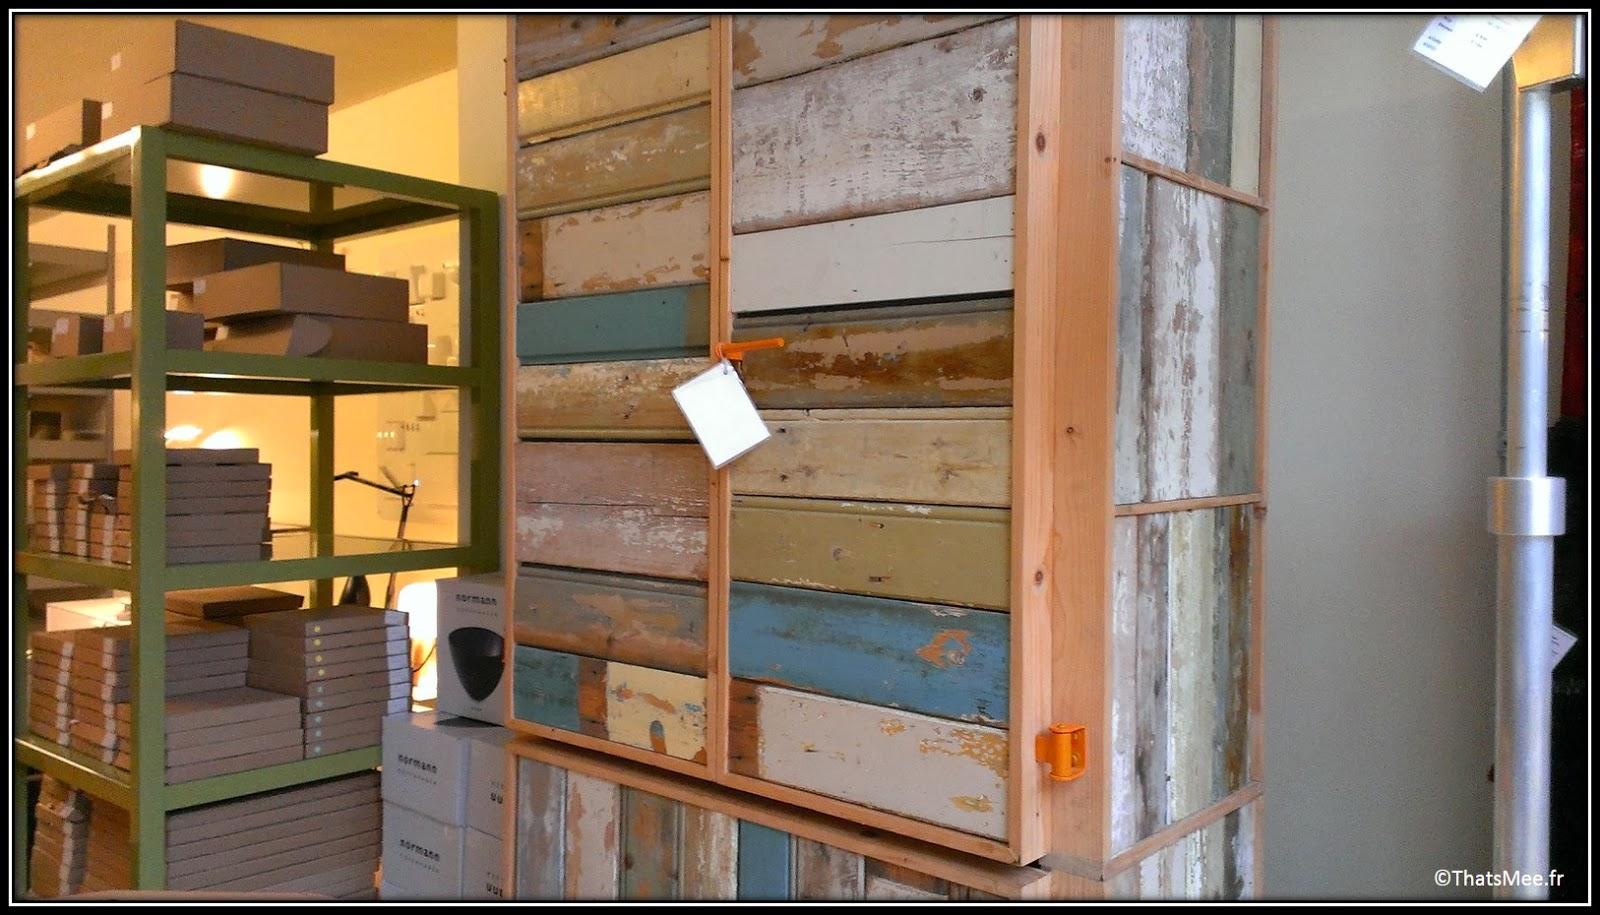 Frozen fountain deco concept-store design Amsterdam meuble bois recyclé